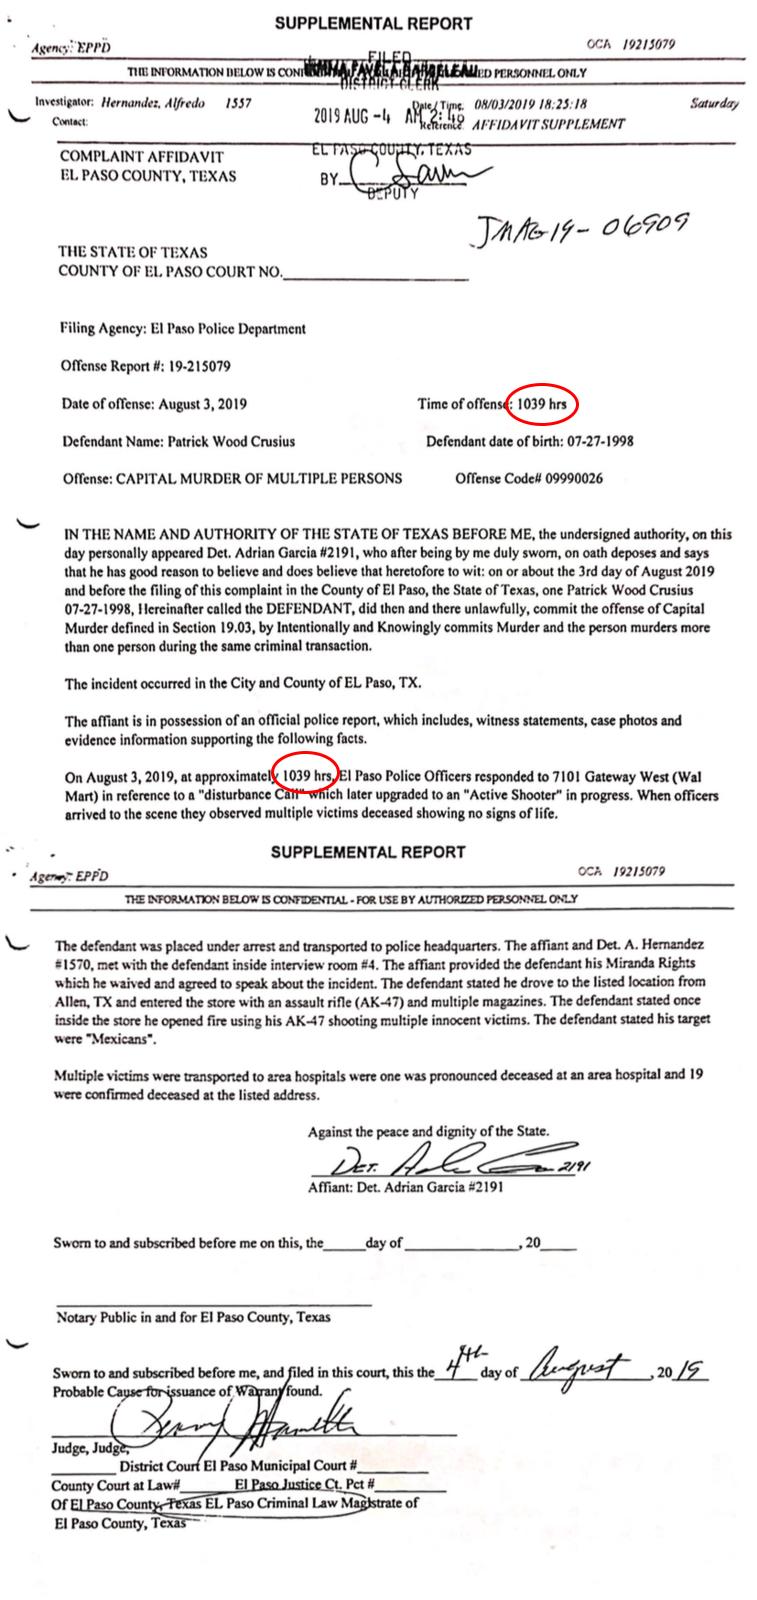 patrick-crusius-arrest-warrant-affidavit.png